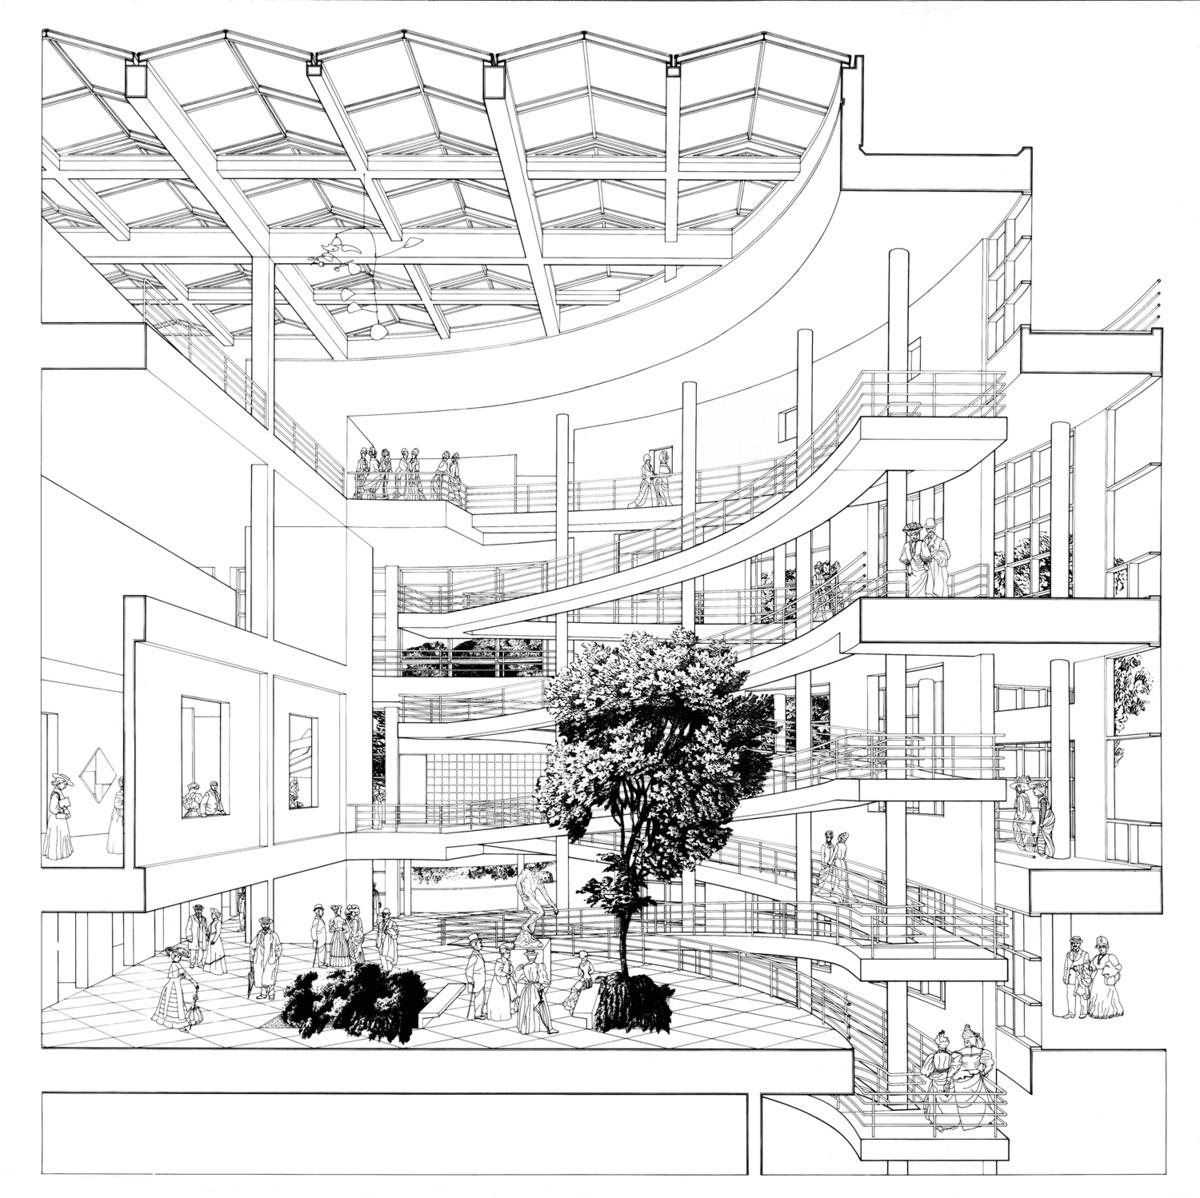 High Museum - Richard Meier & Partners Architects